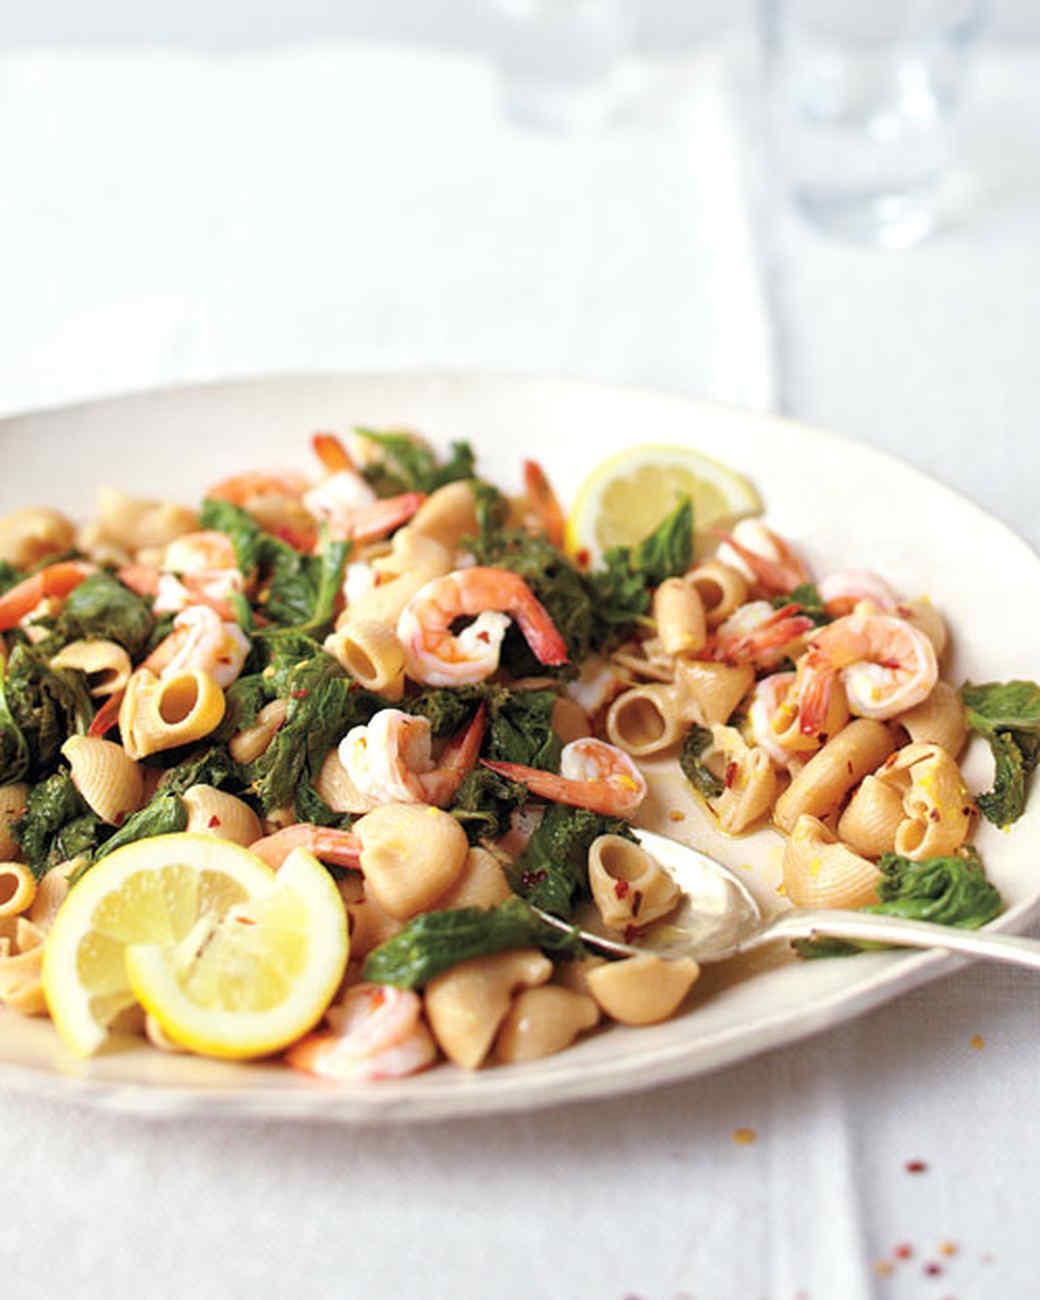 Mustard Greens, Shrimp, and Anchovy Pasta